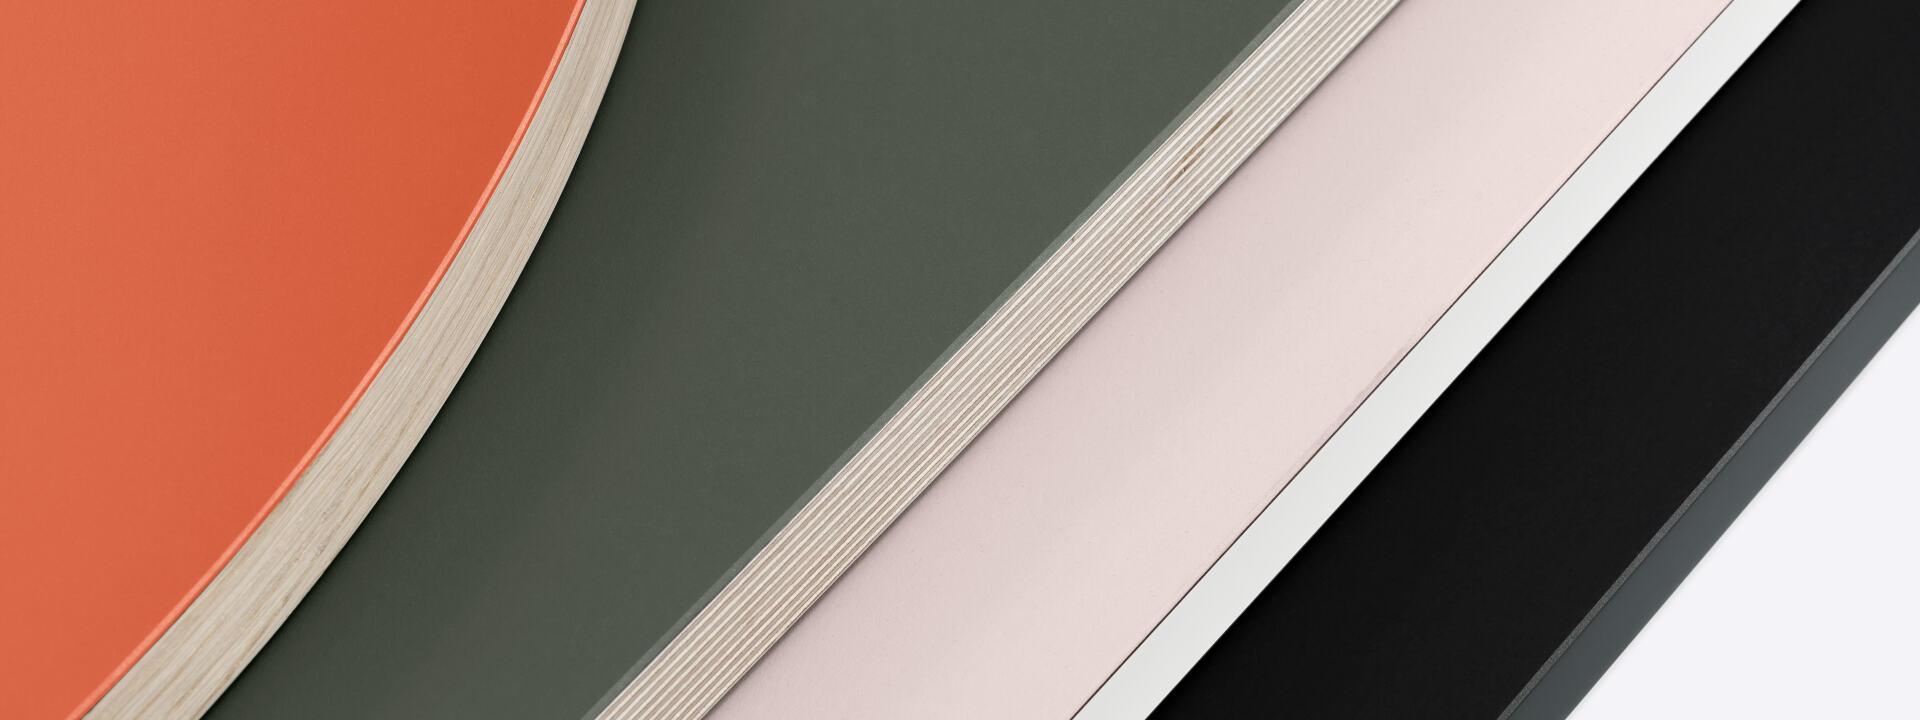 Linoleum Tischplatte Basic, Tischplatten, Linoleum Tischplatte, Linoleumplatte